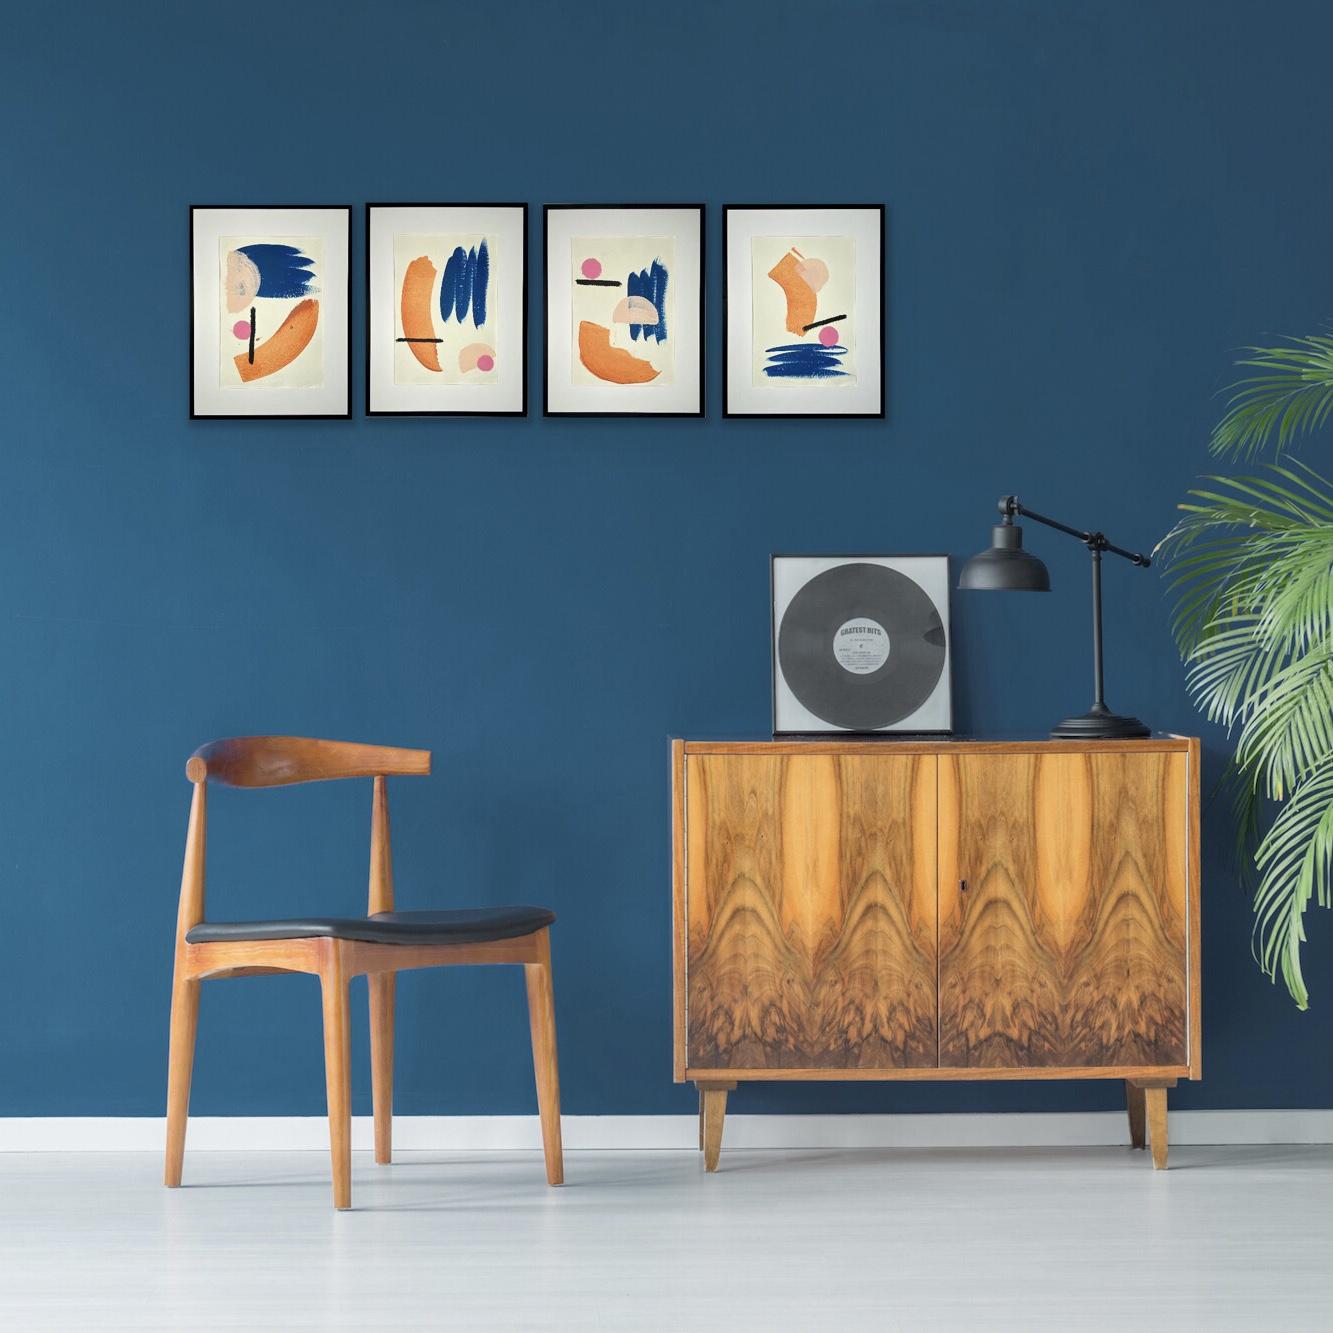 Modern original art set in a stylish setting